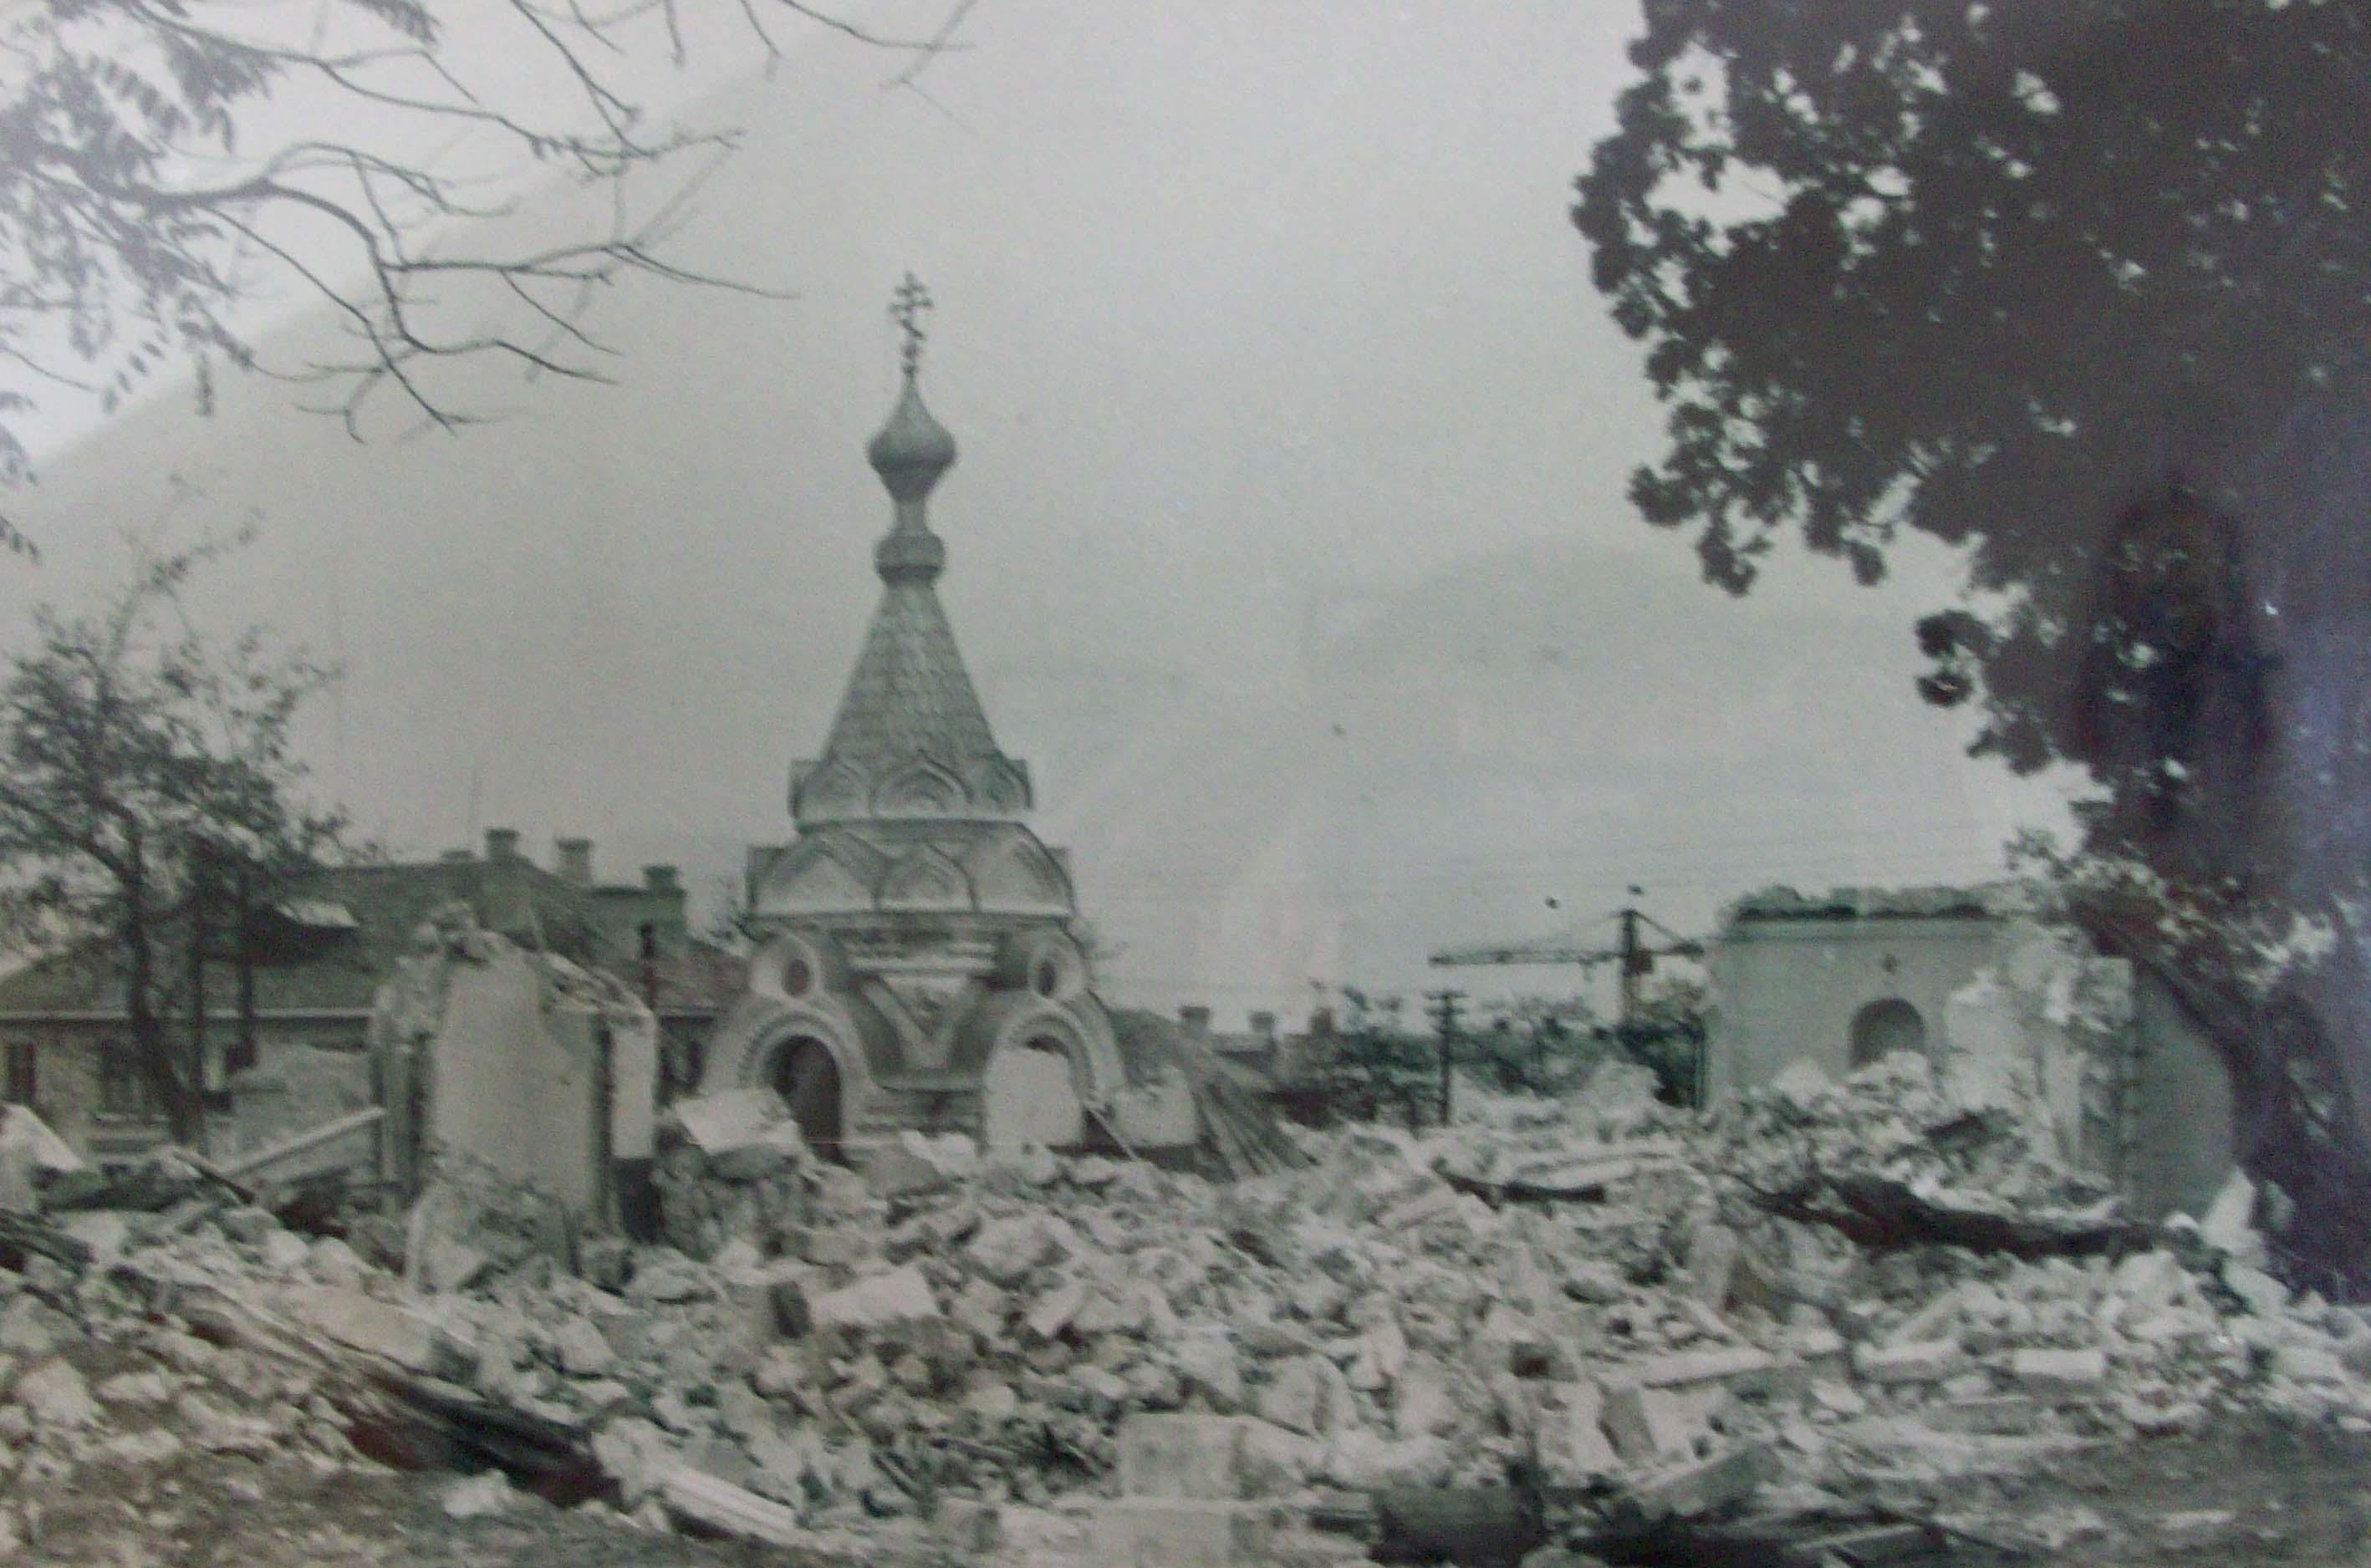 Razrusheniy_Hram_Vseh_Sv_1961g.jpg